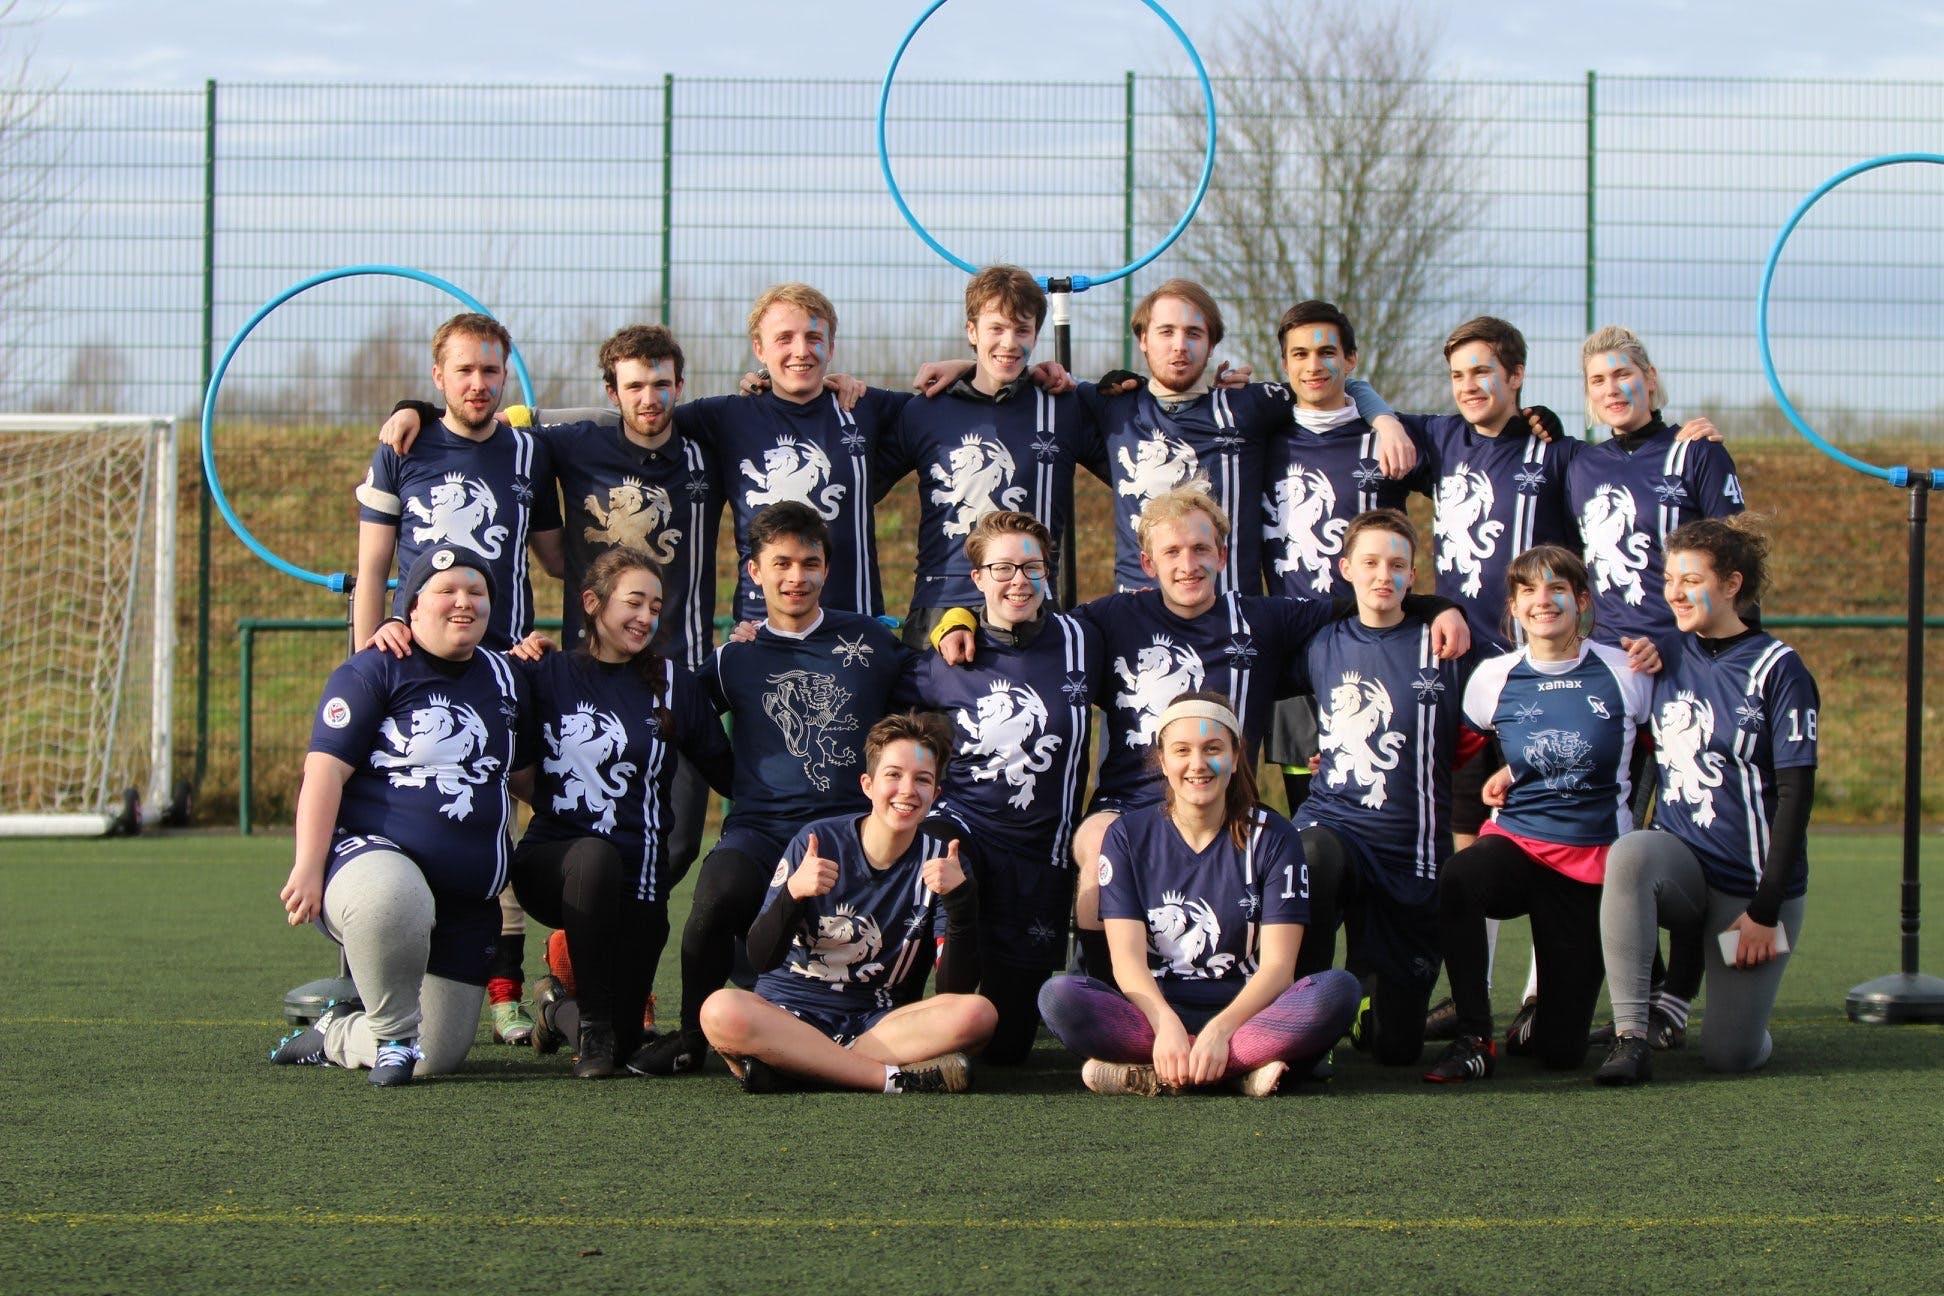 Oxford Universities Quidditch Club